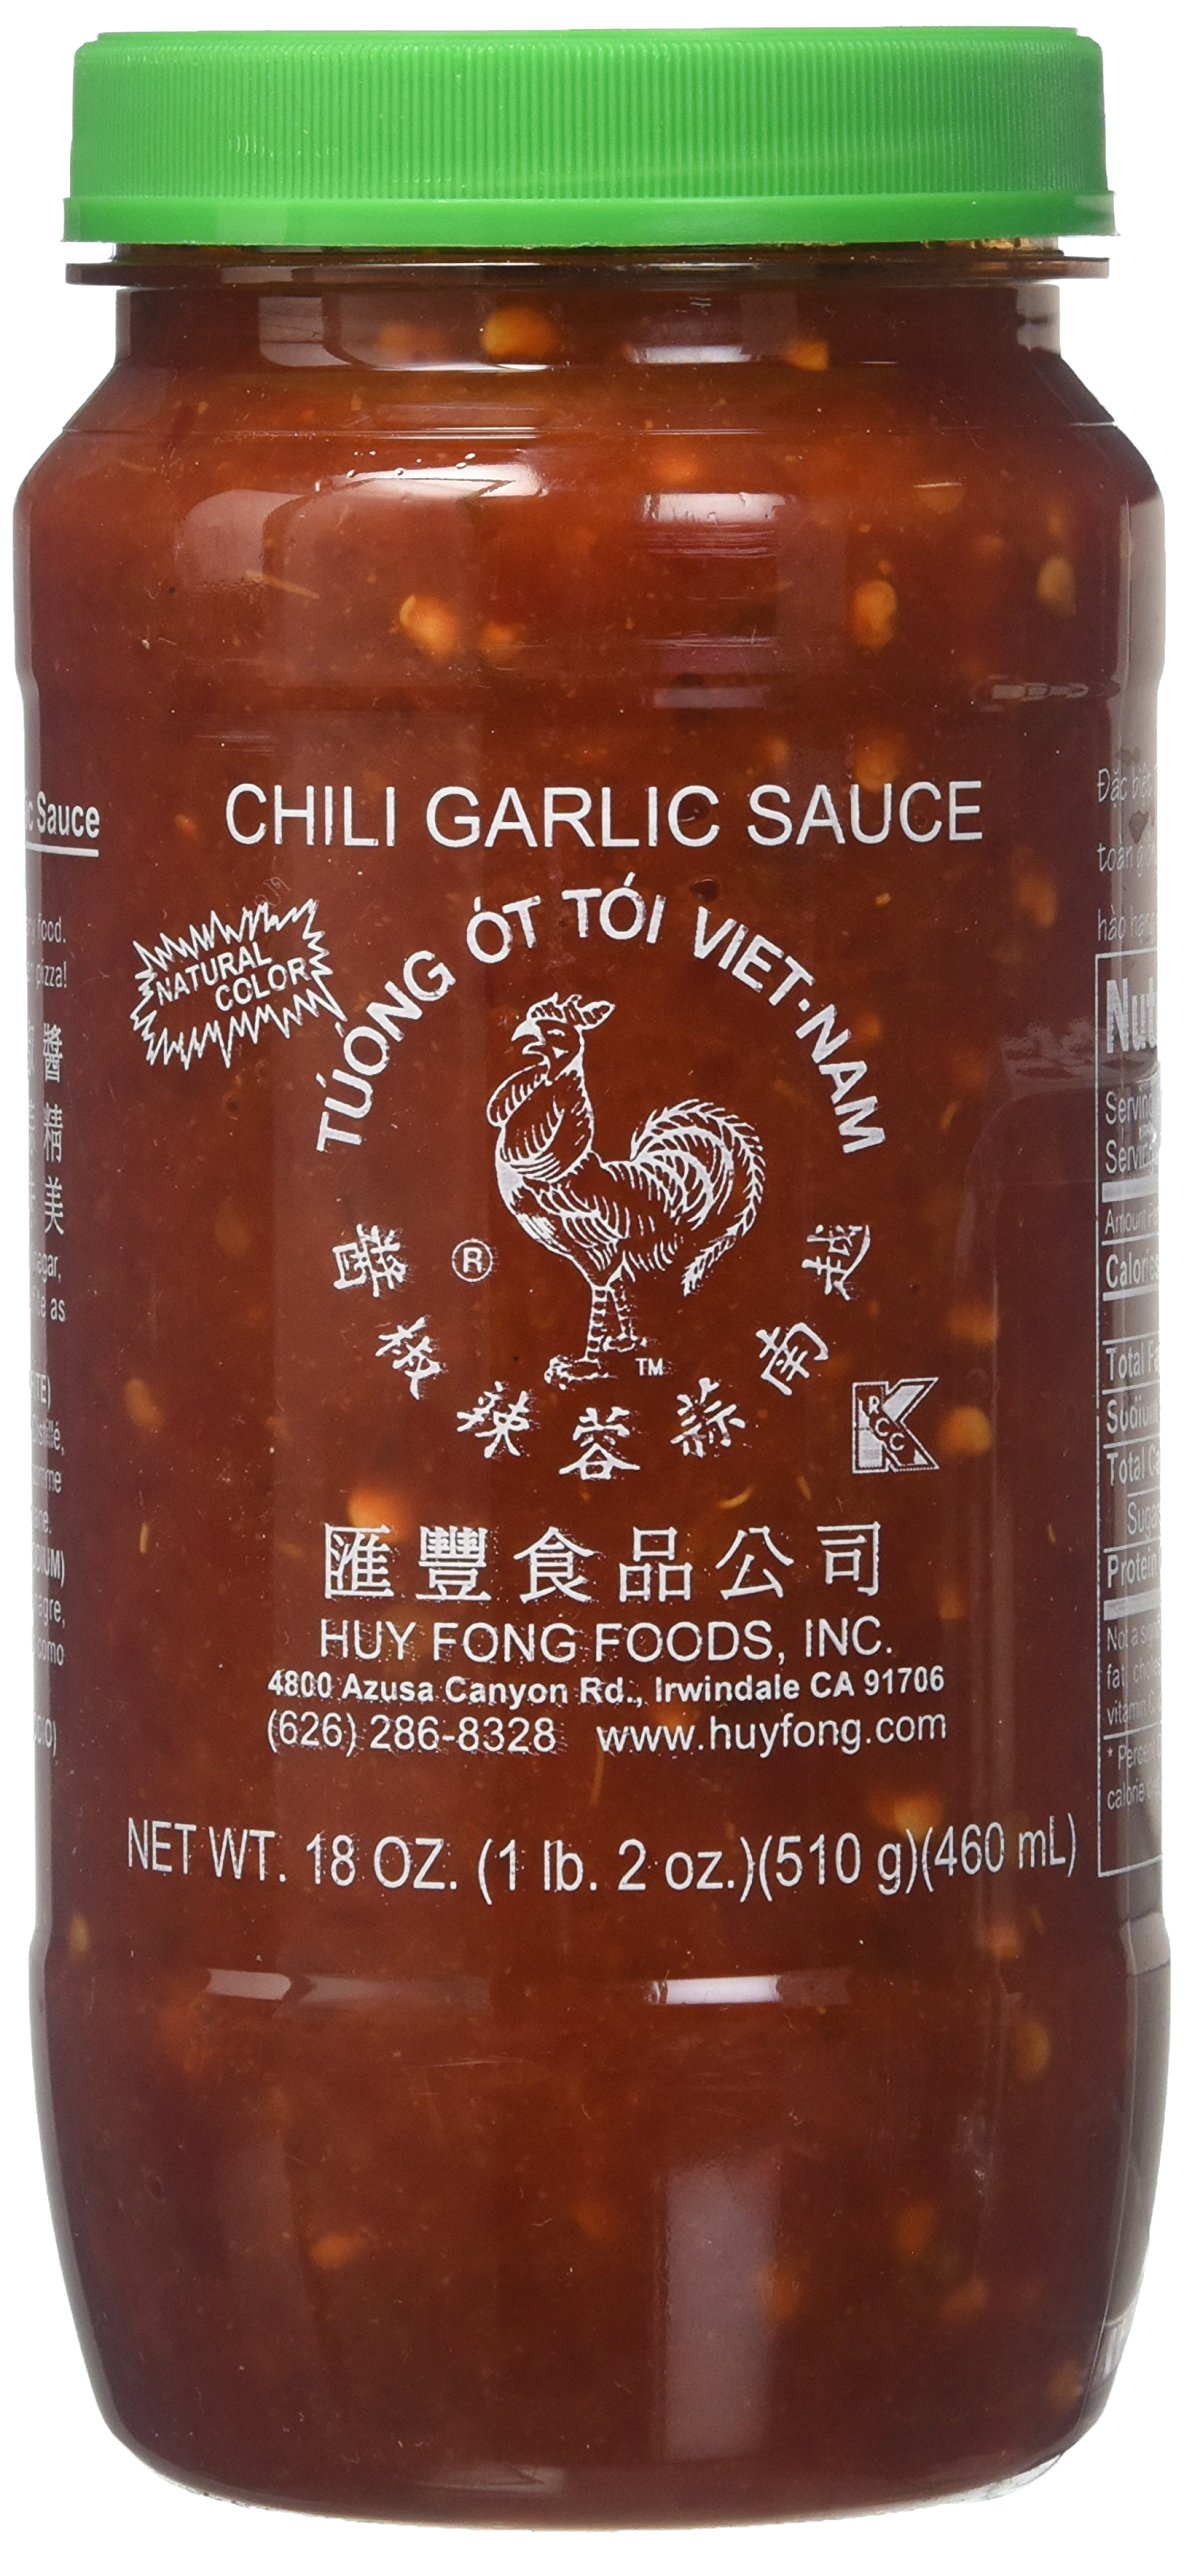 Huy Fong Sauce Chili Garlic,18 oz